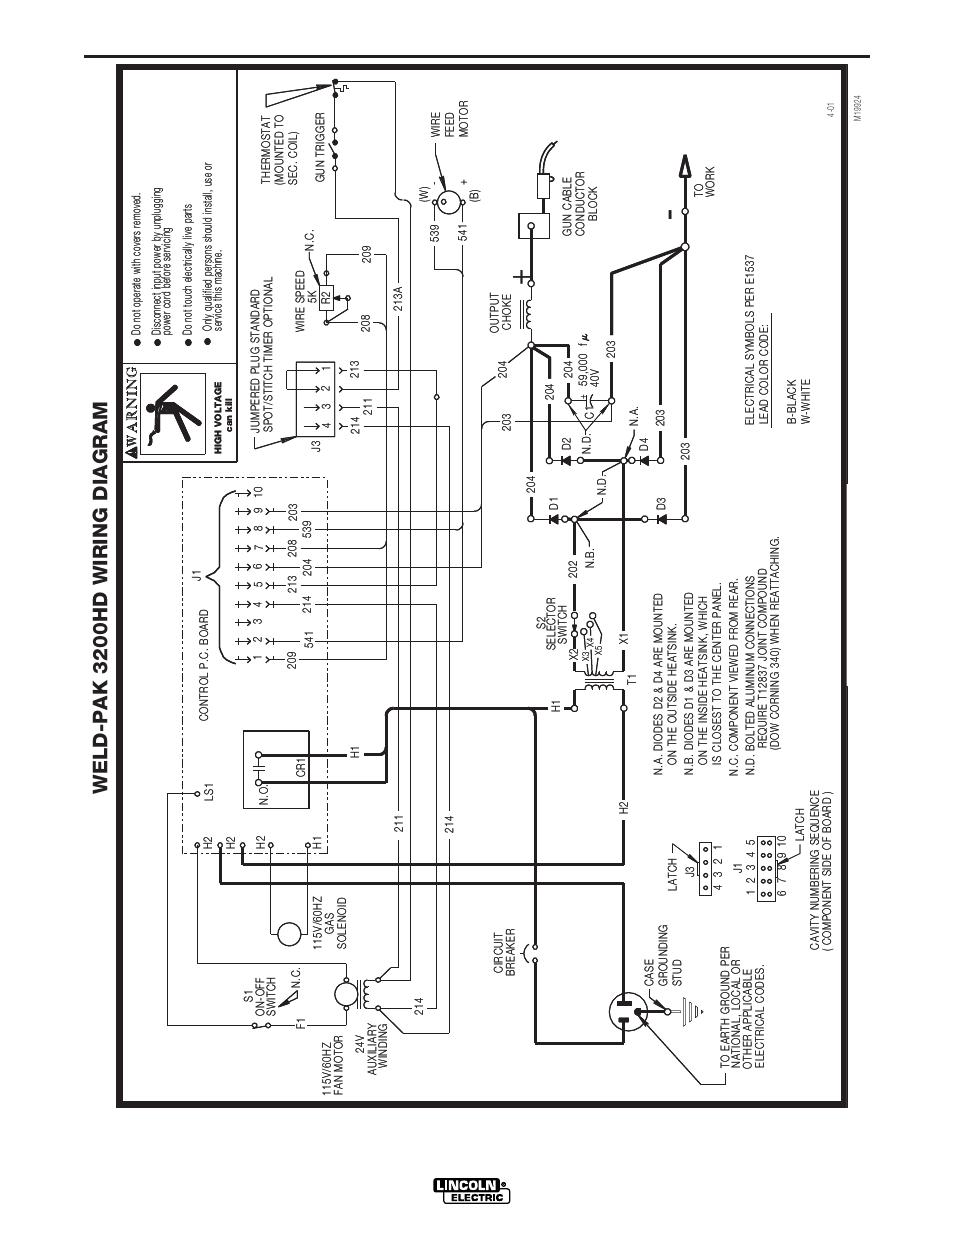 lincoln 200sa welder wiring diagram